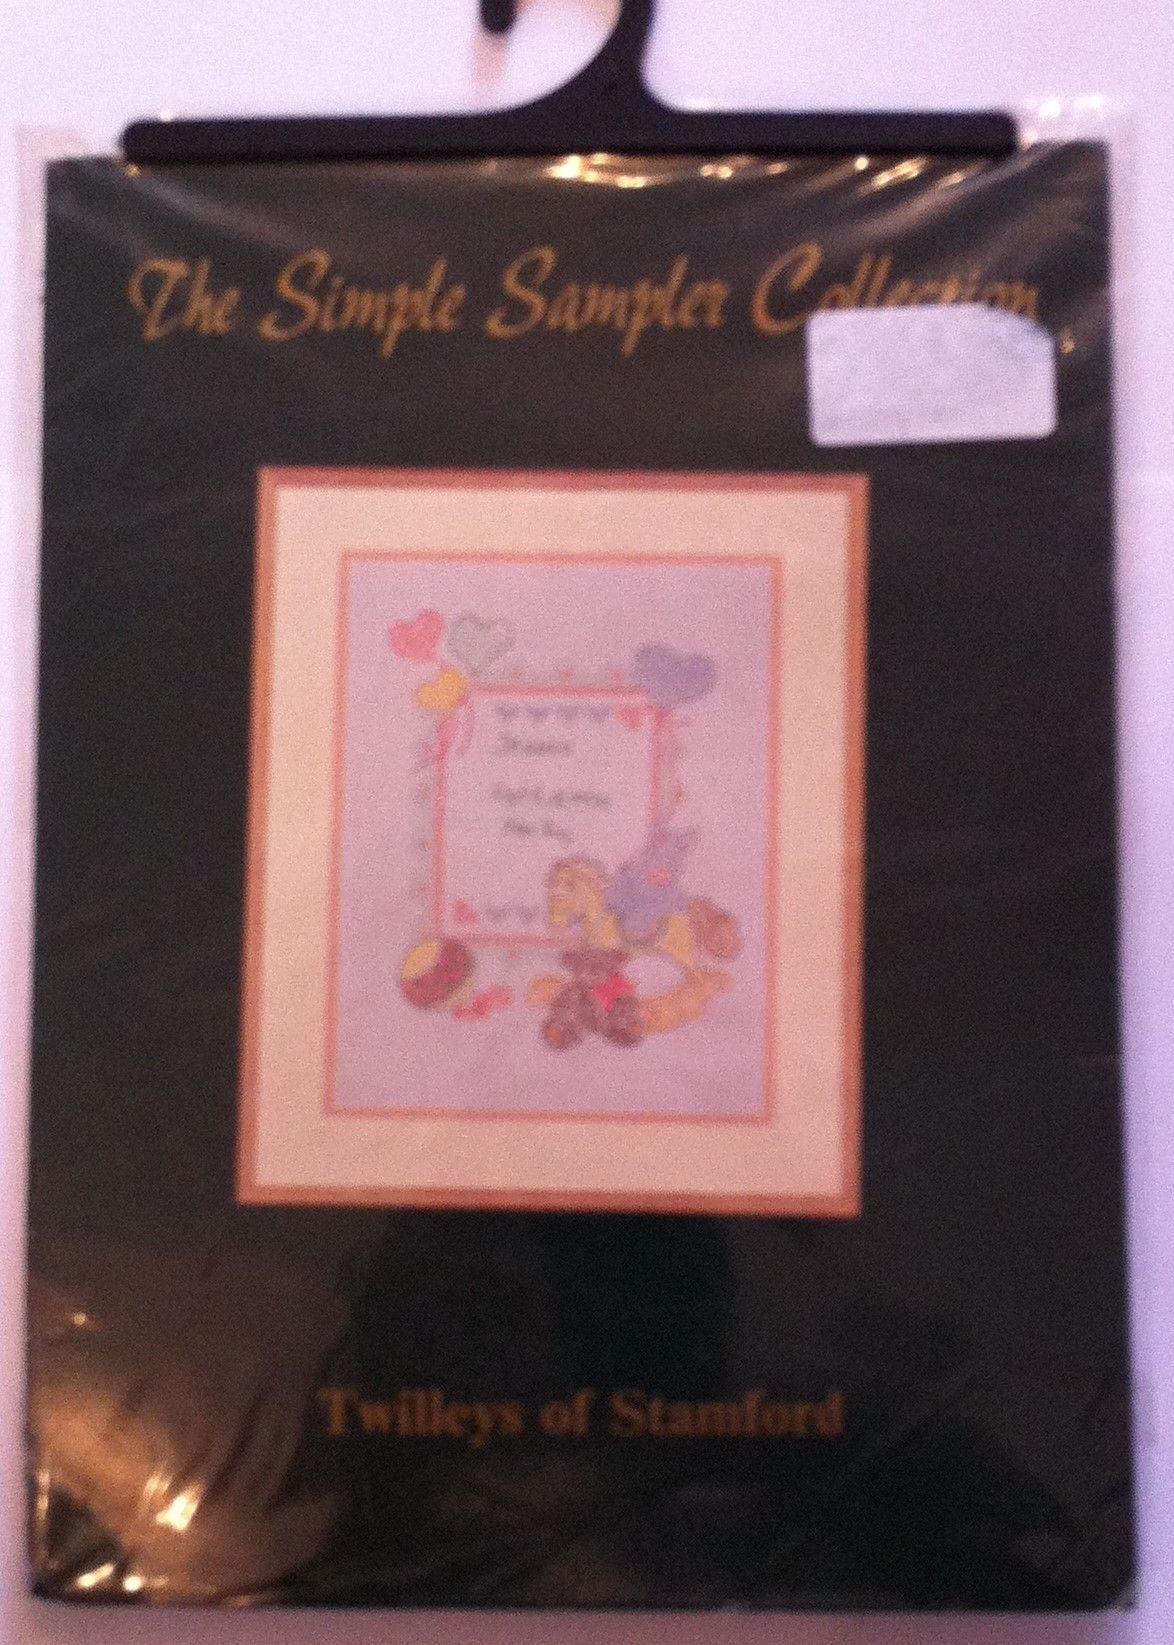 kit 1014 cross-stitch bunny & bear sampler